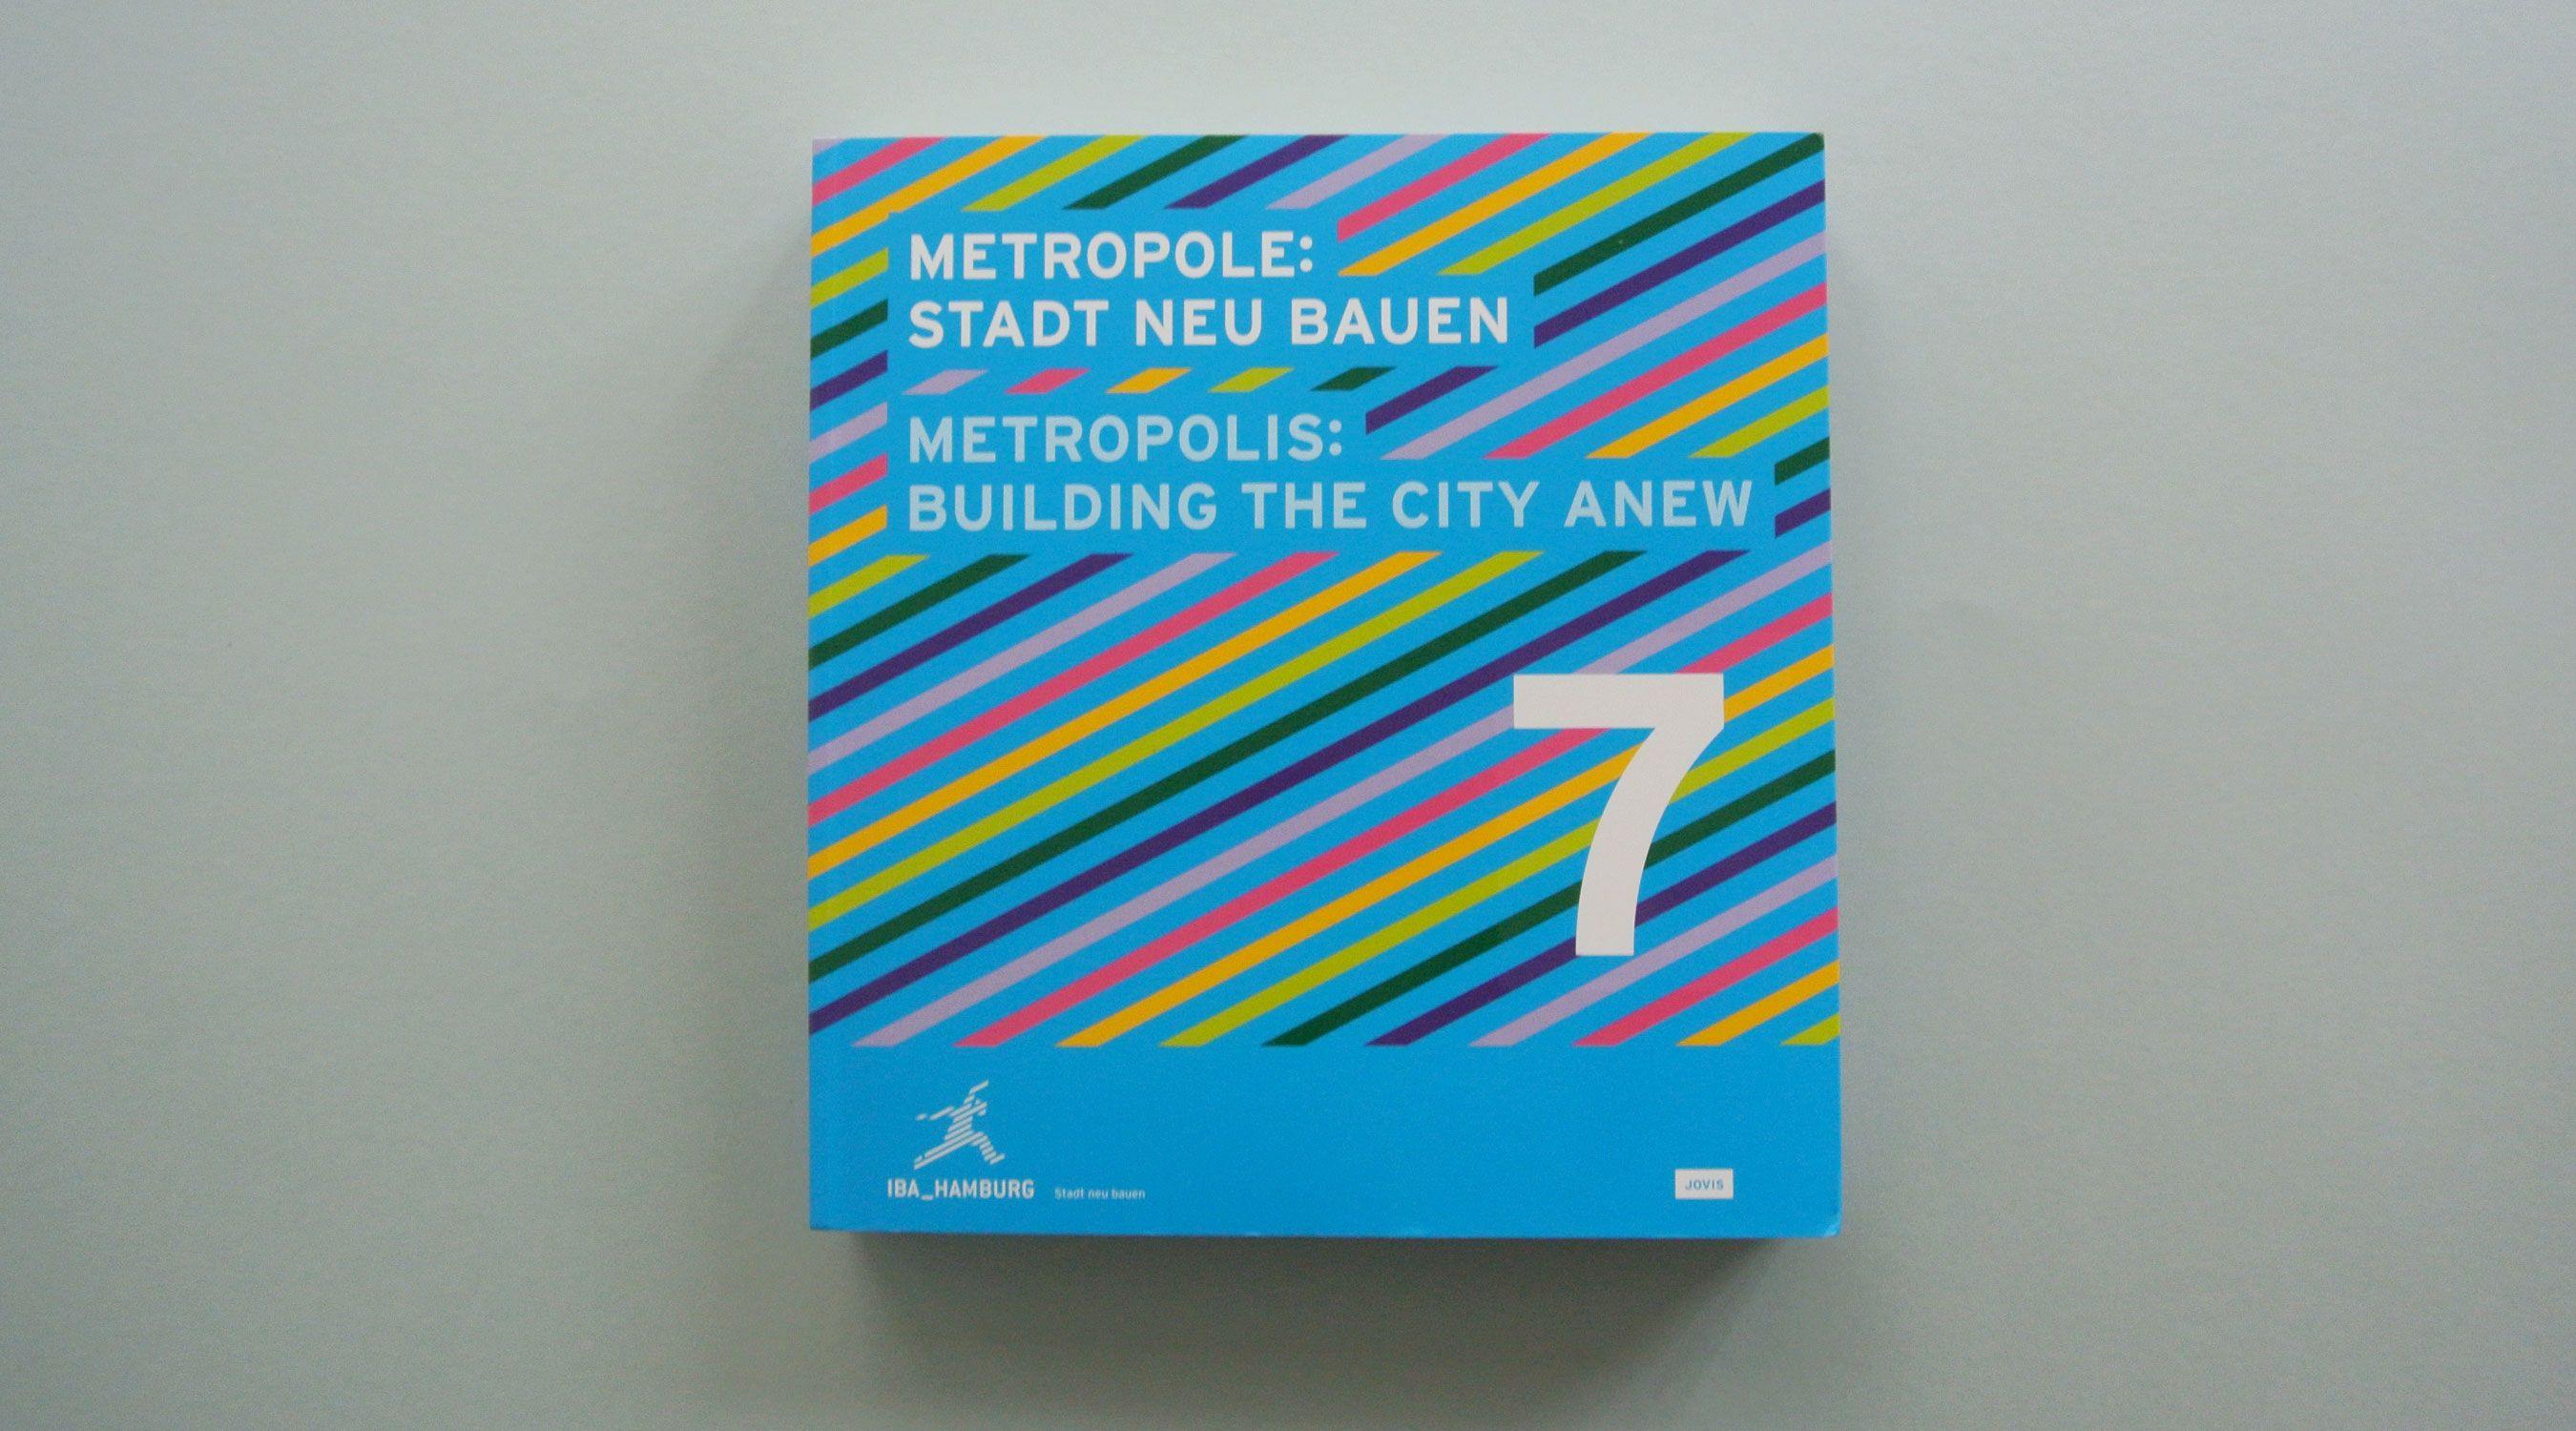 IBA Hamburg Metropole 7 Prolog Metrozone